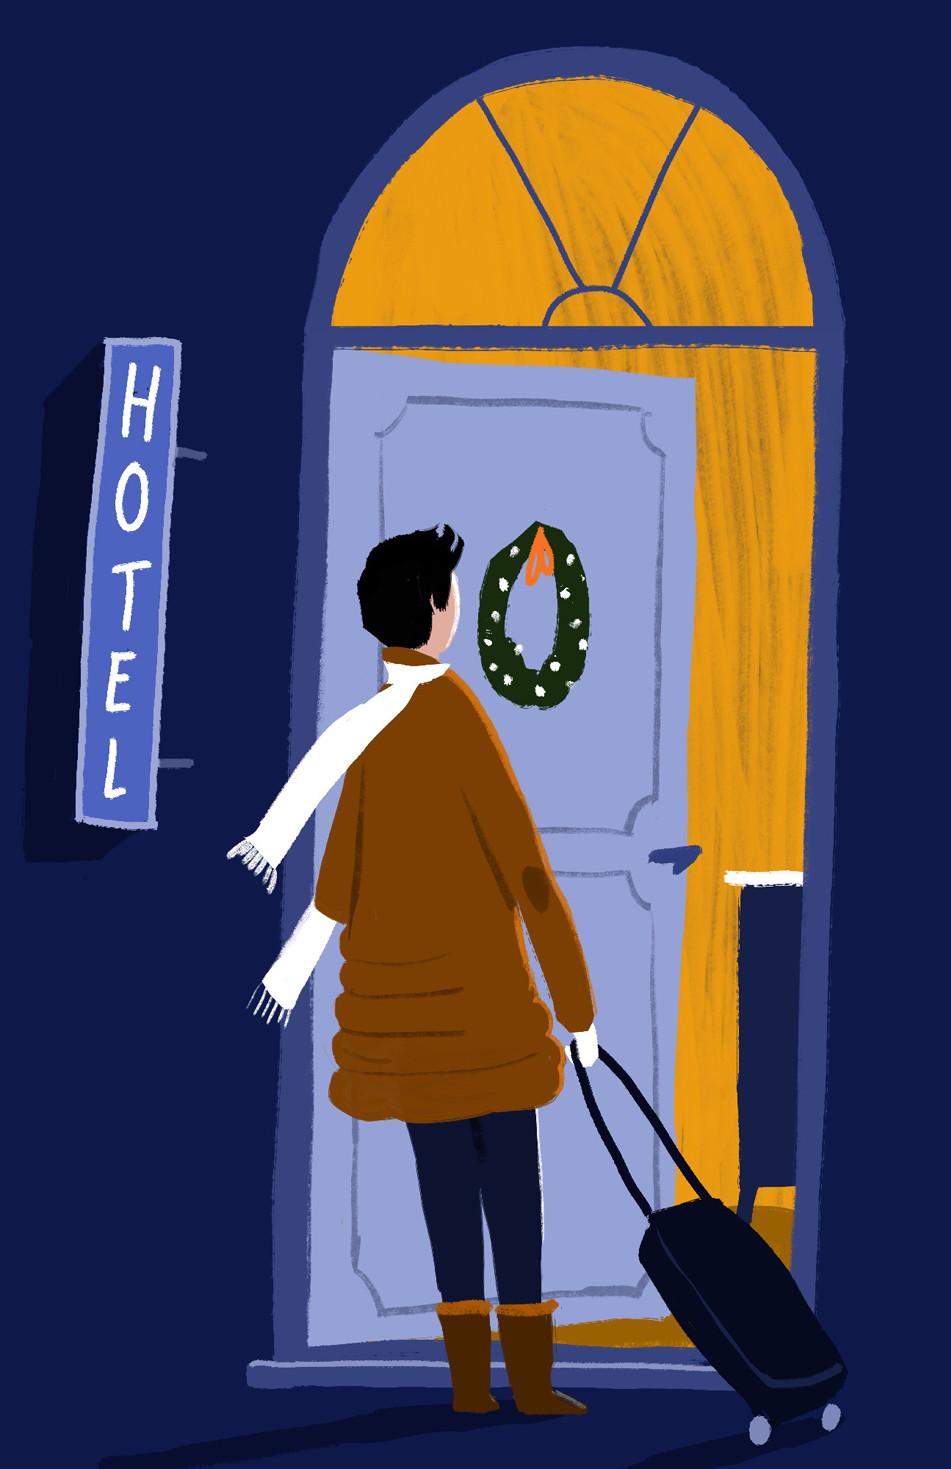 Hotelska ponuda, Advent Zagreb